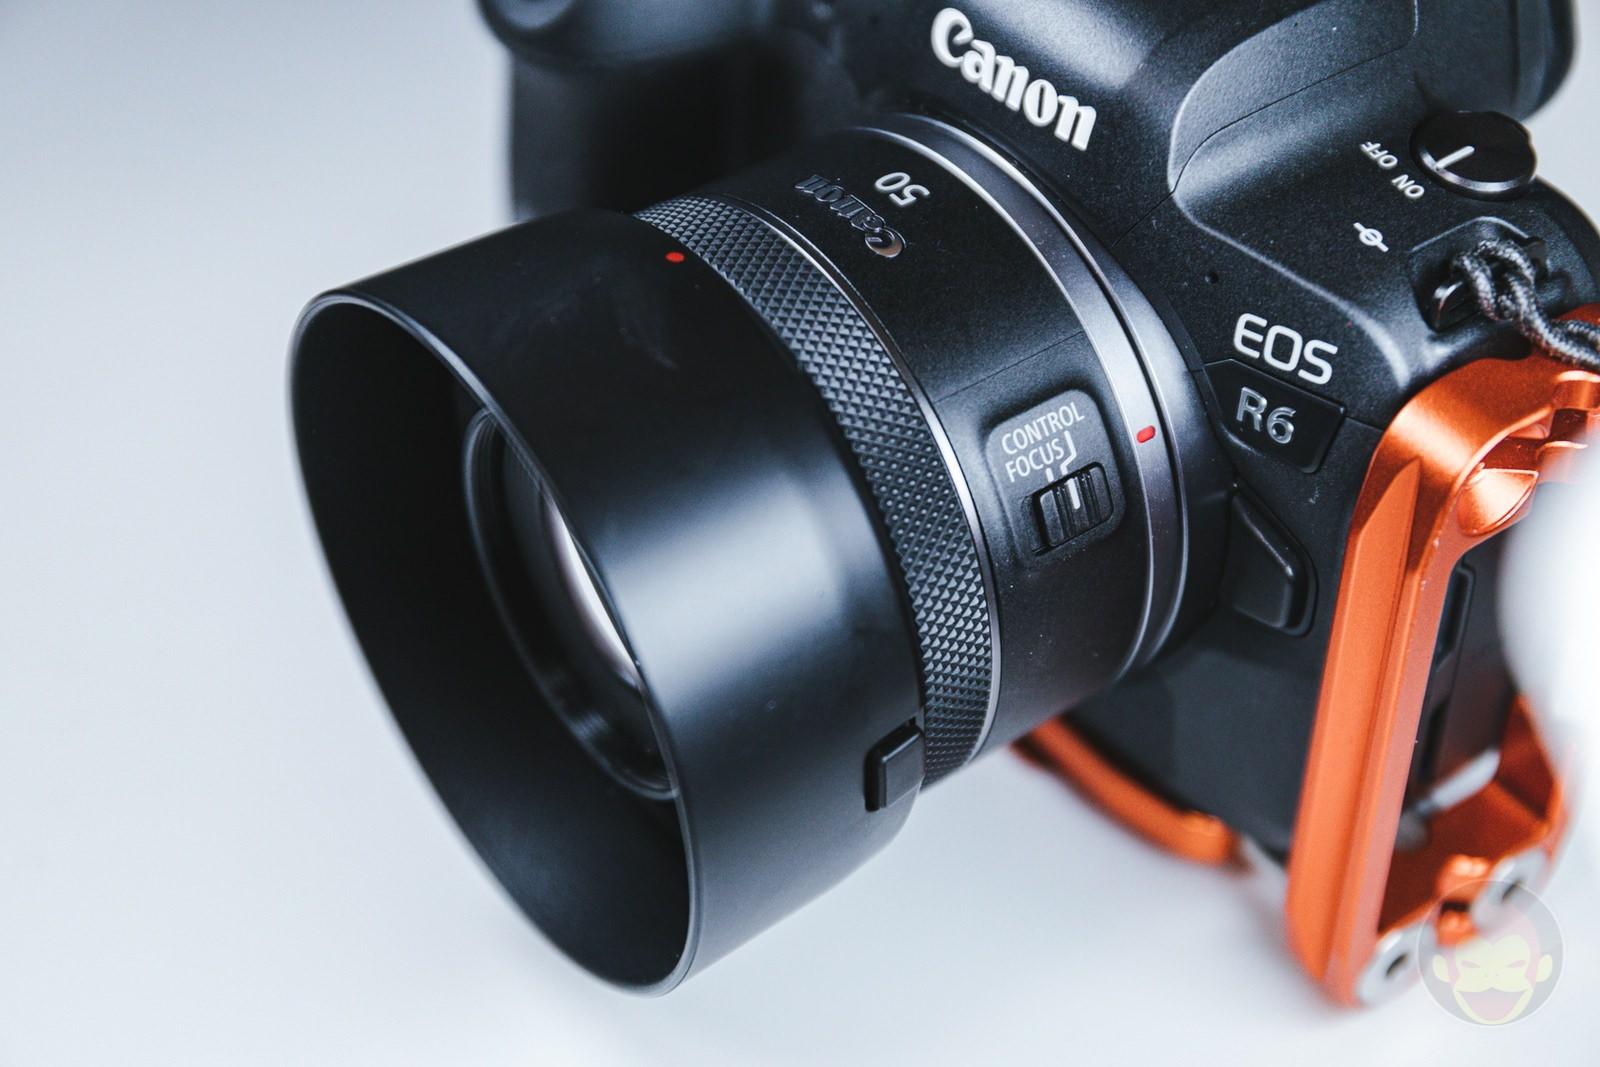 RF50mnm-F18-STM-Review-06.jpg